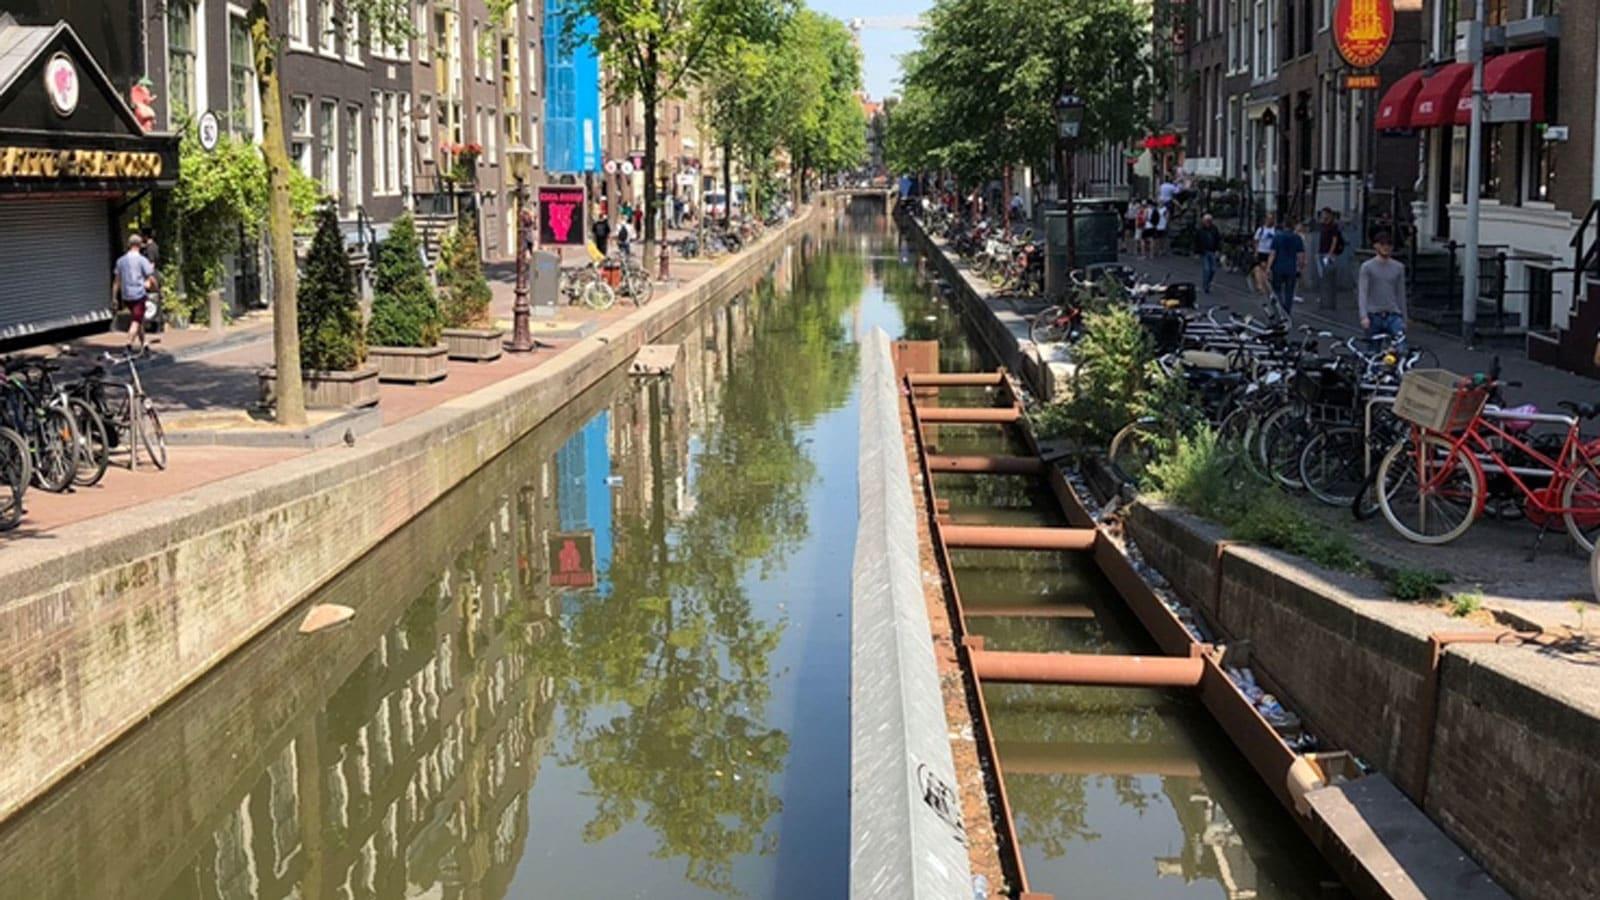 شاهد.. مراسل CNN على متن قارب موسيقي بنهر في أمستردام